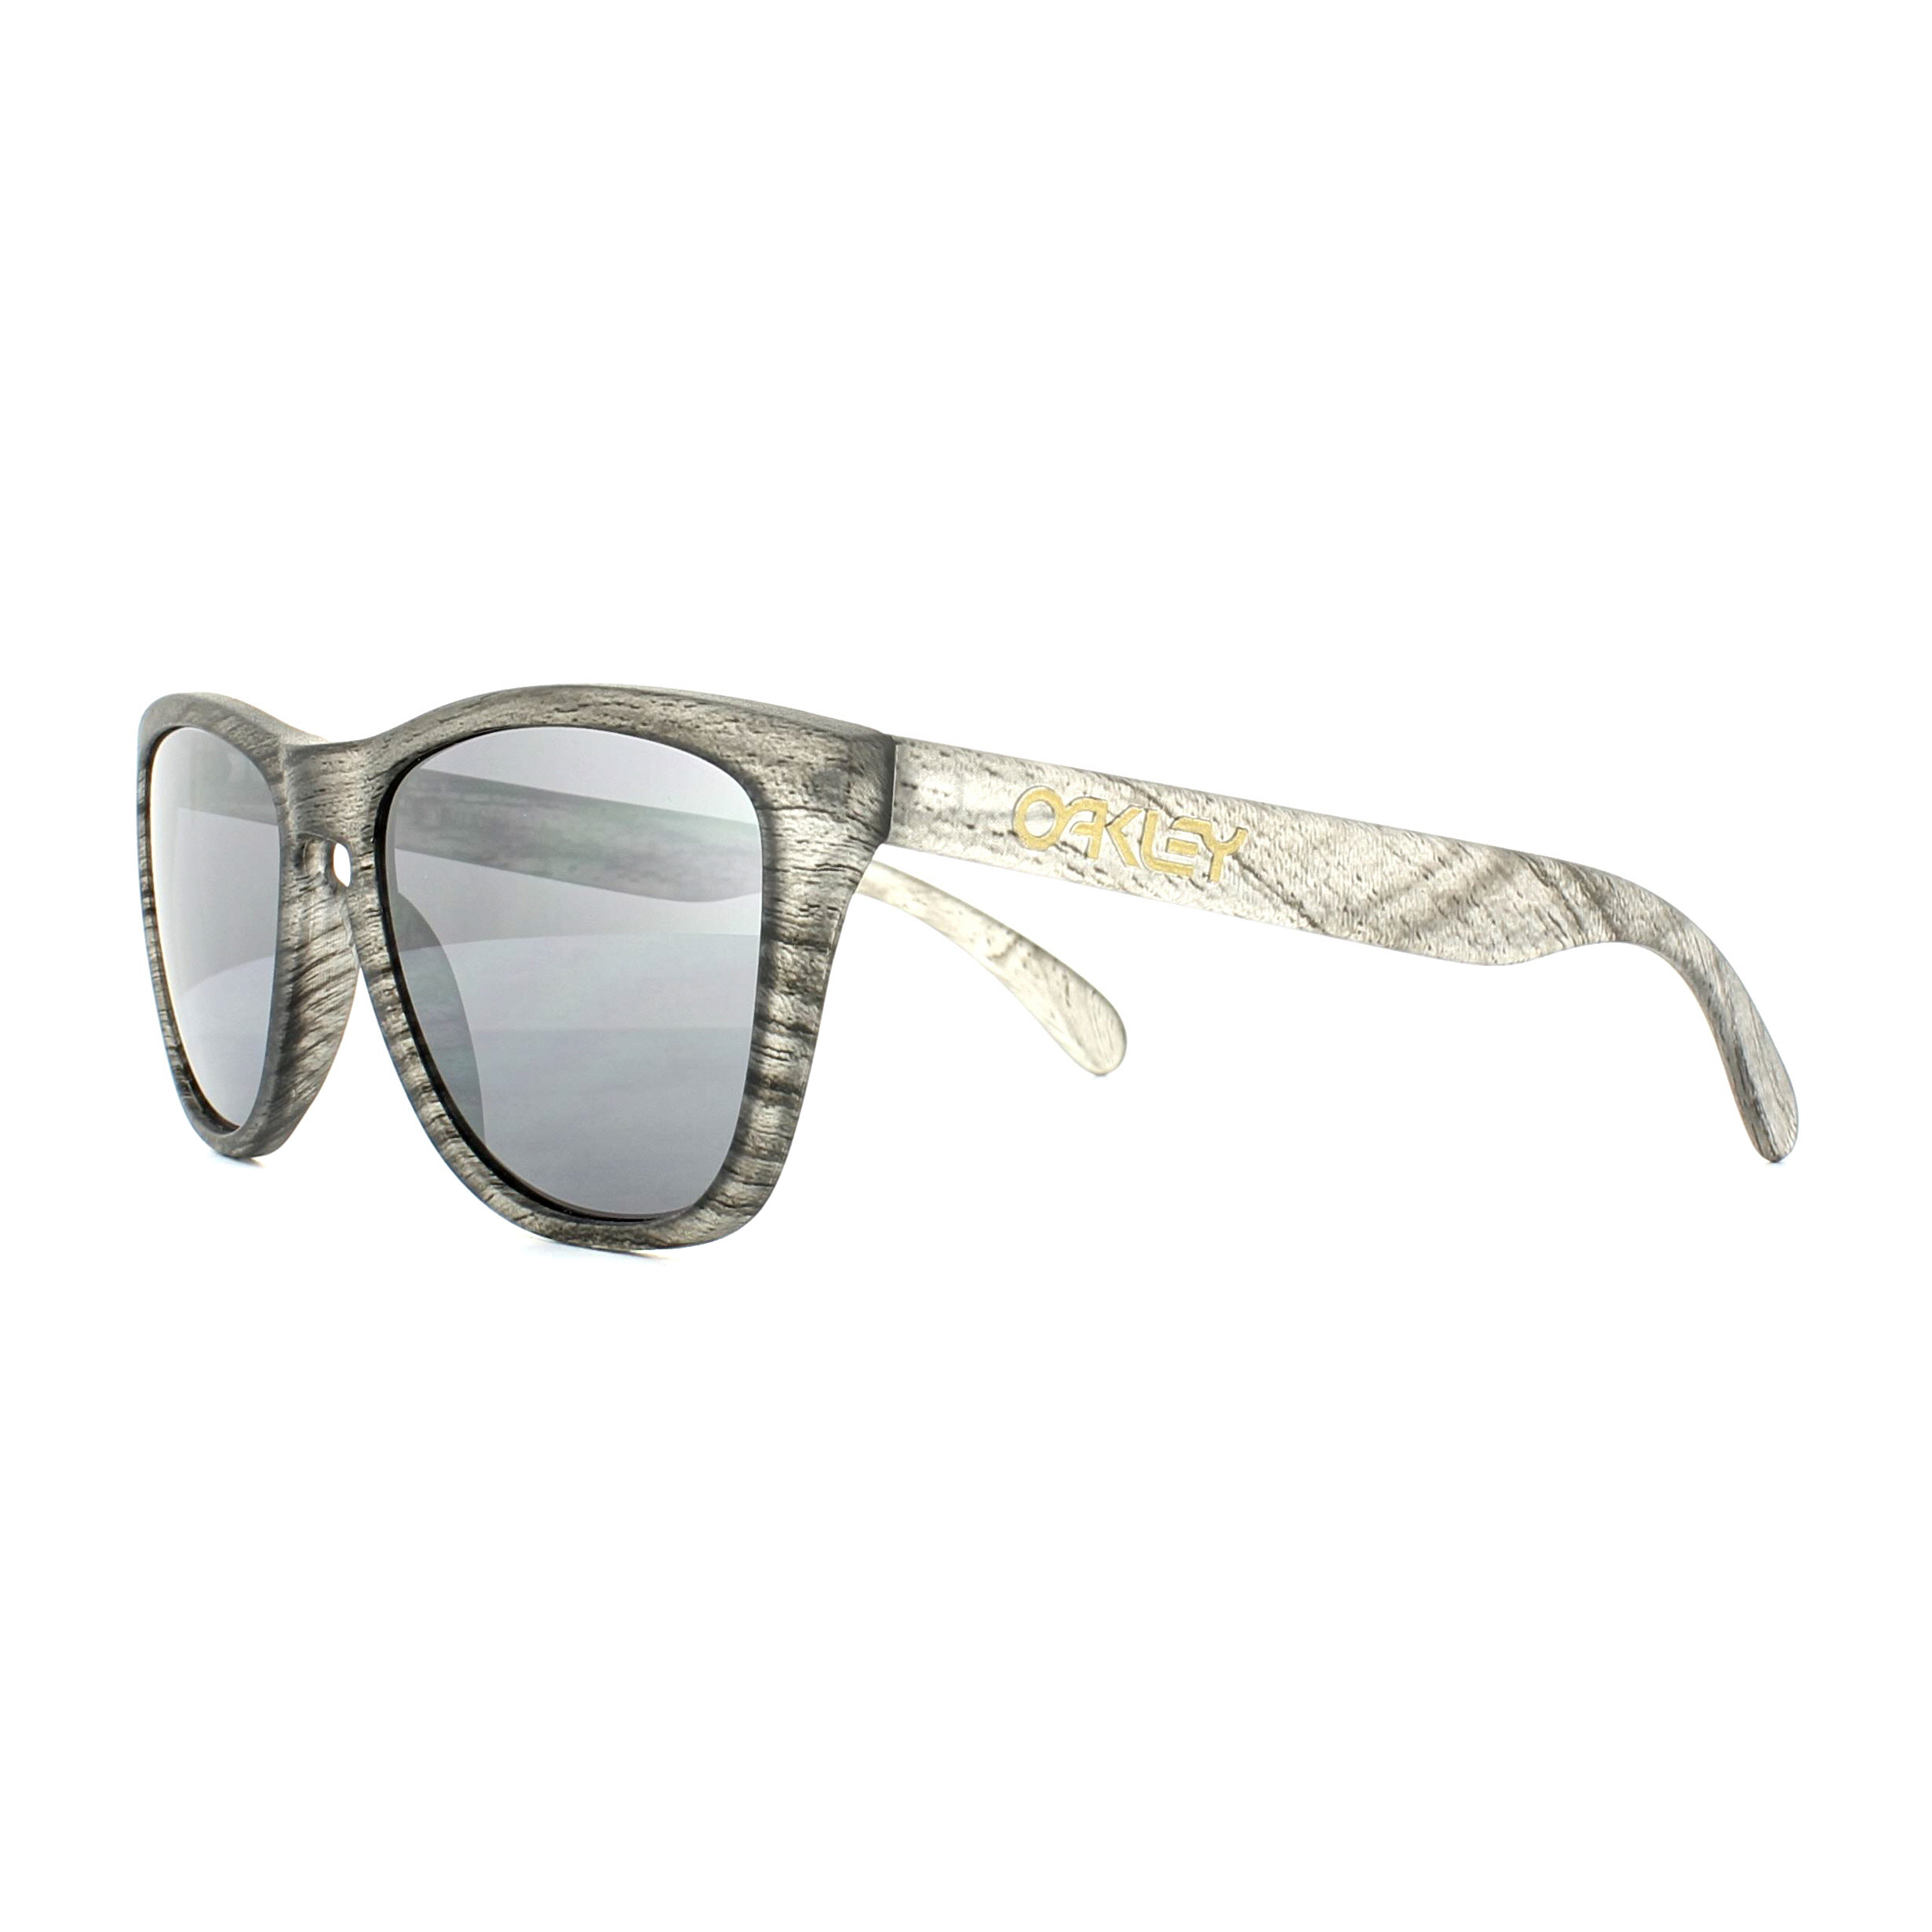 ONE SIZE Oakley Frogskins -matte clear woodgrain/black iridium HIWu9i